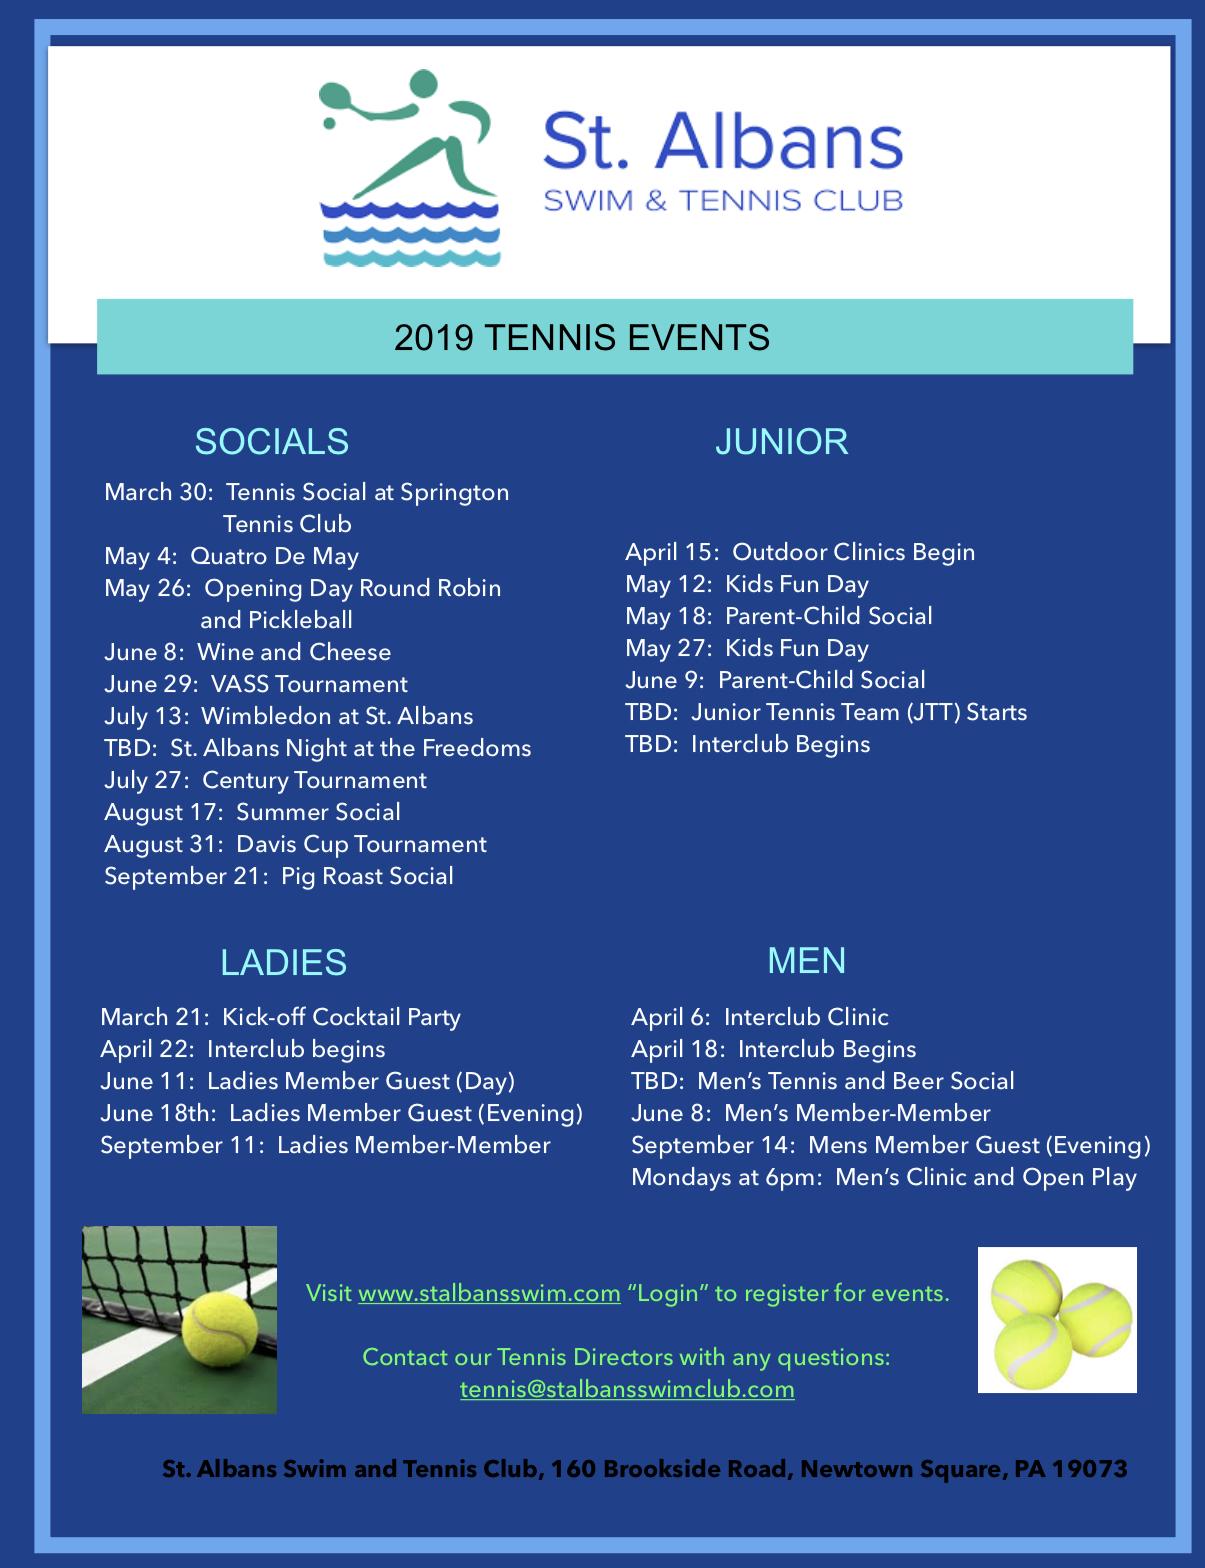 2019 Tennis Events.jpg